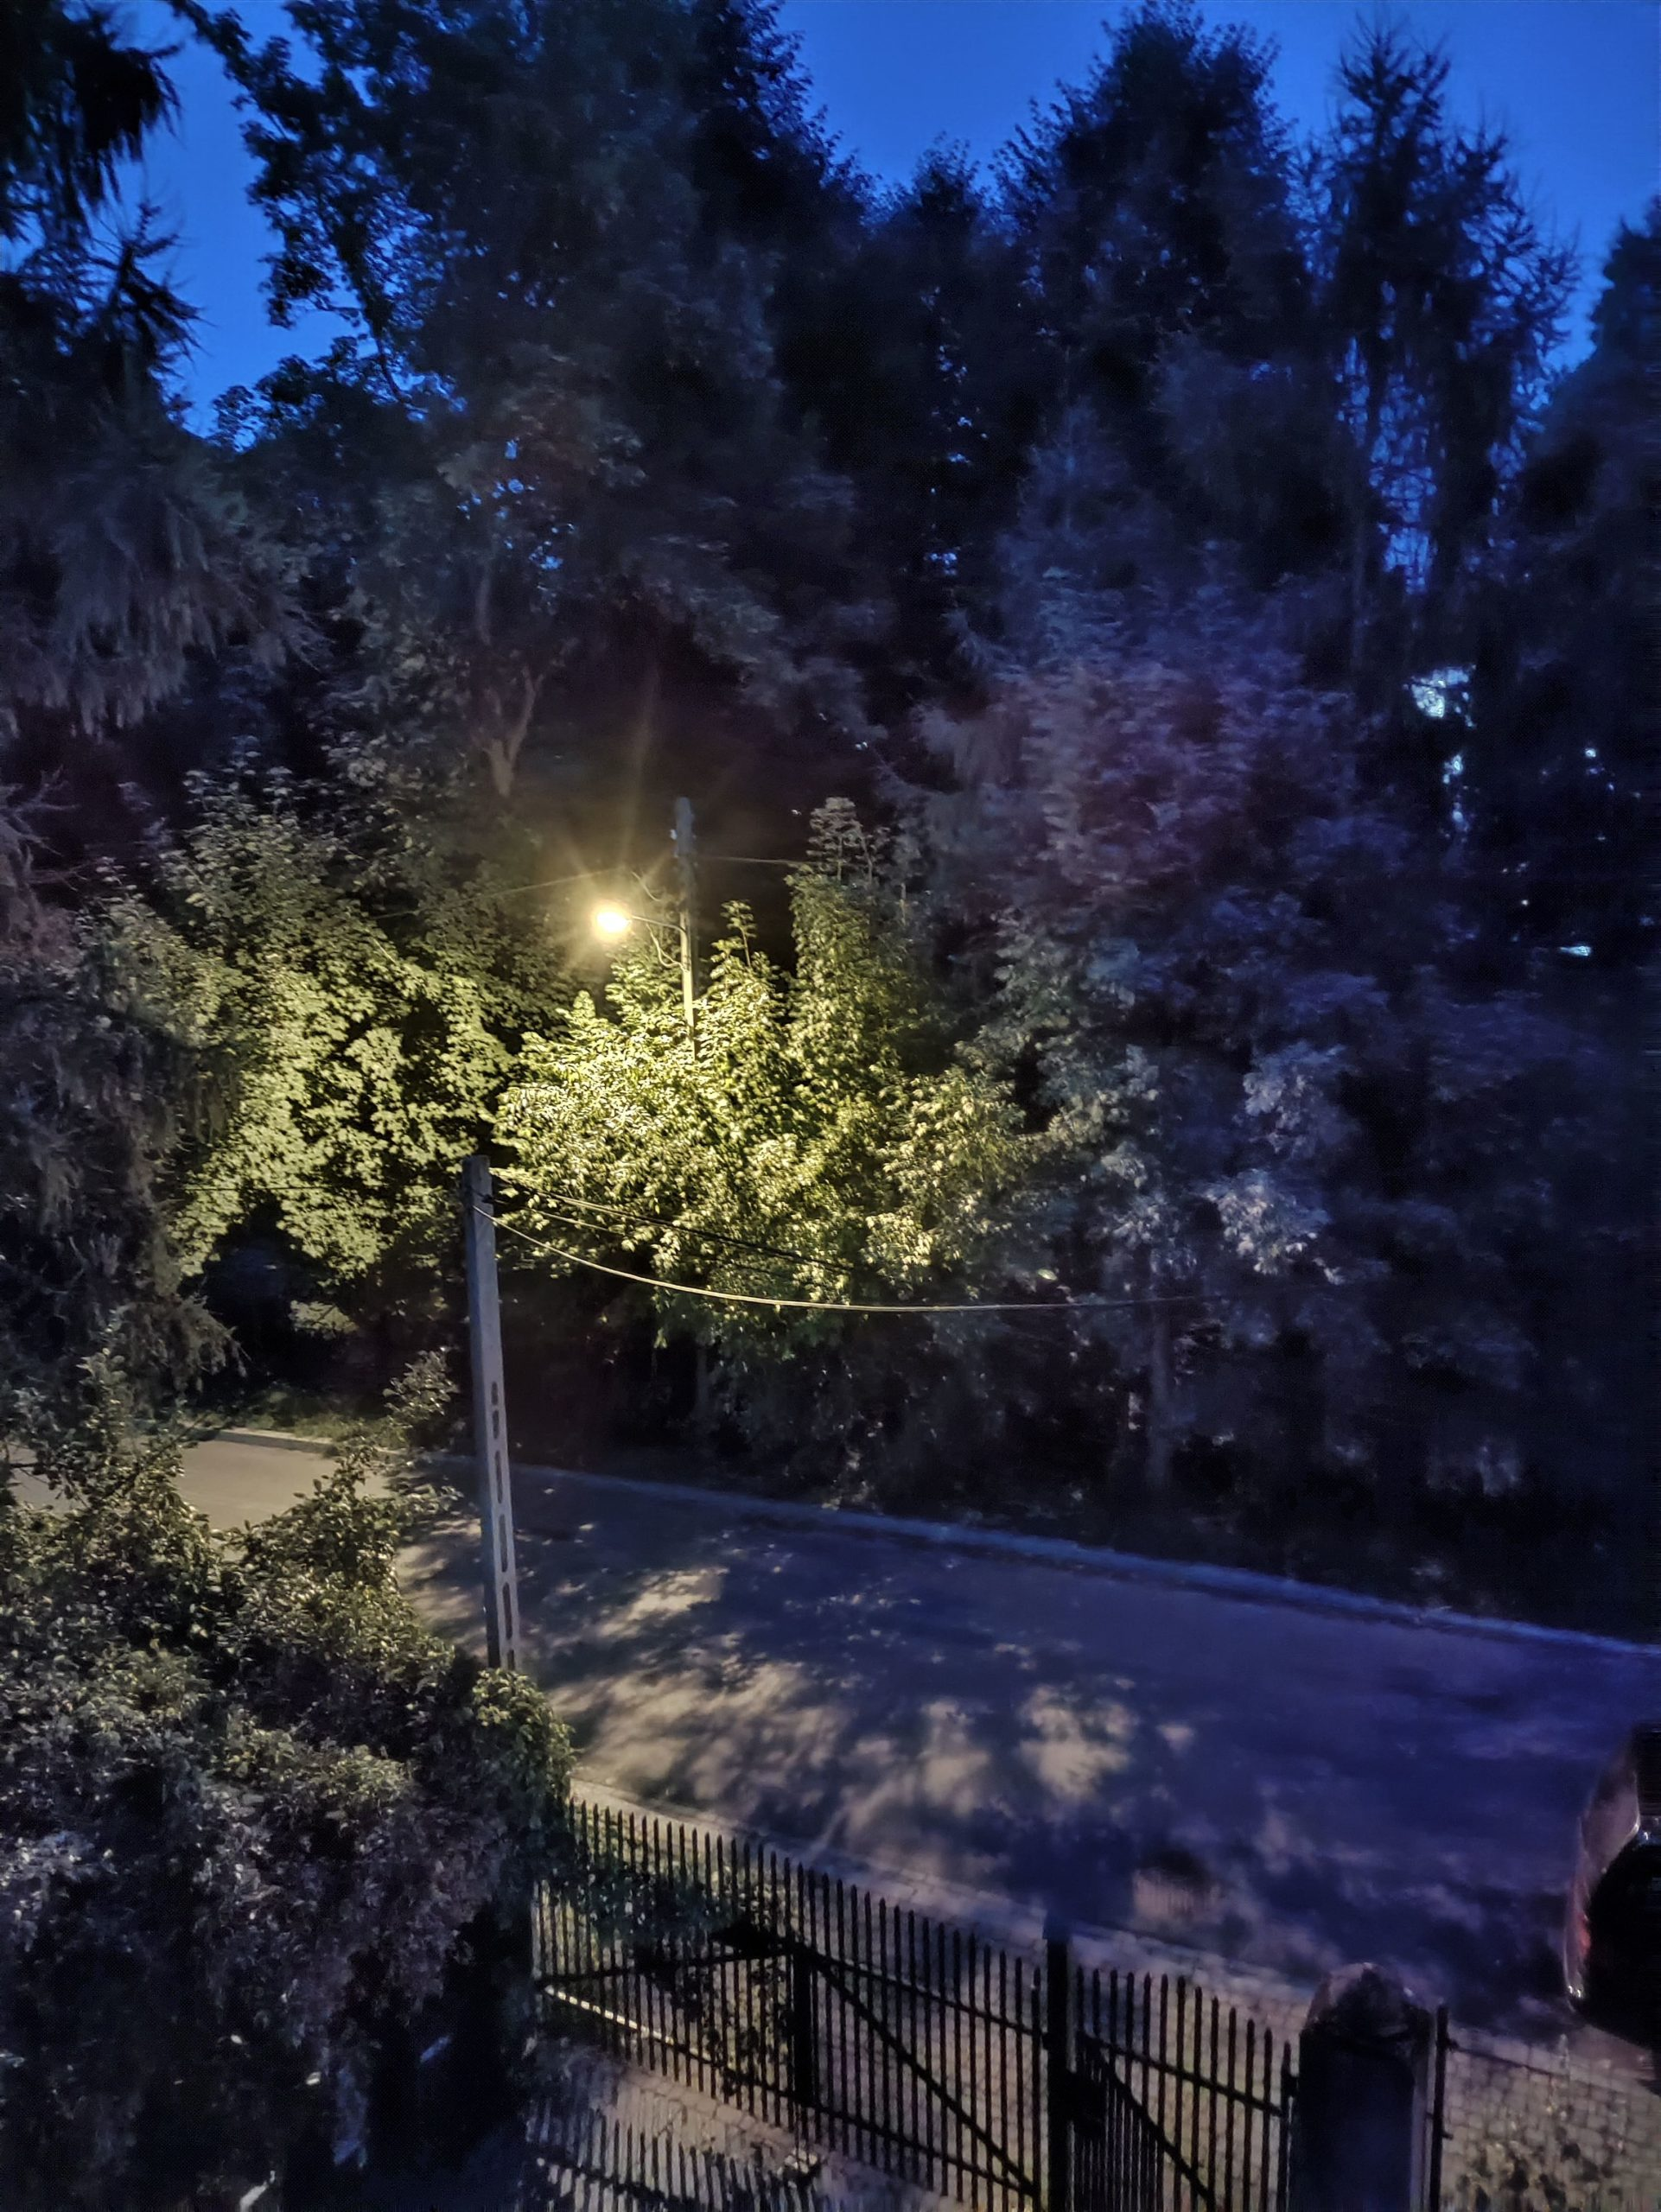 Nord CE 5G noc z trybem ulica o zmroku